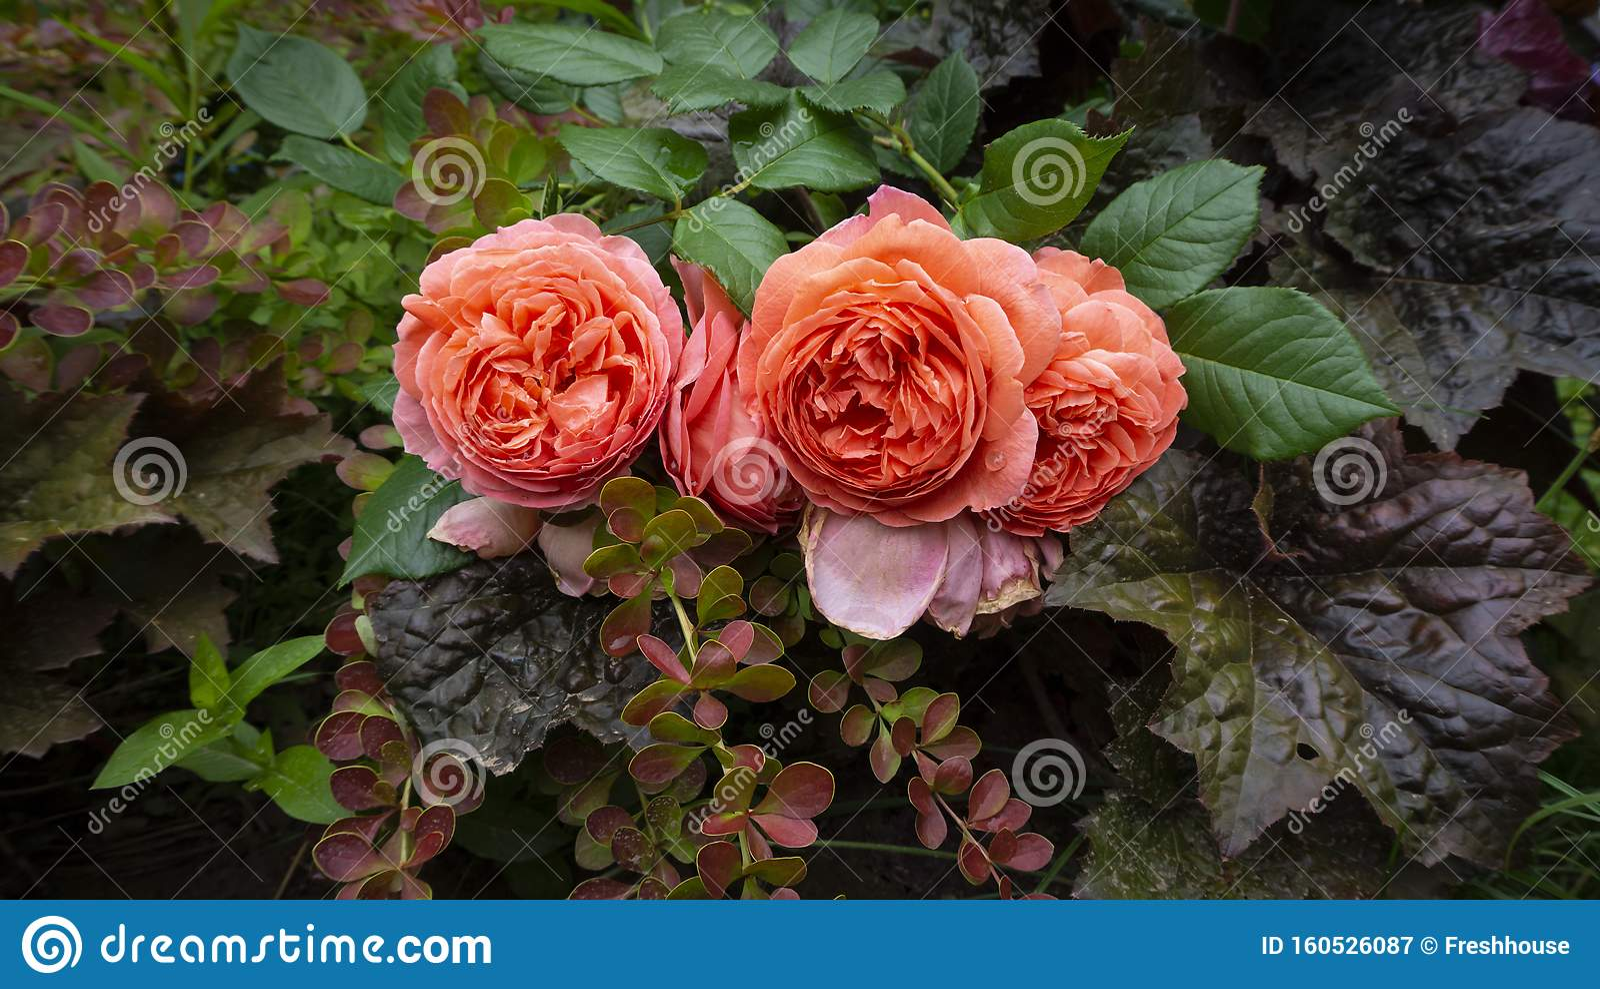 Floral Arrangement Of David Austin S Orange English Rose Summer Song Burgundy Geyhera And Barberry Computer Desktop Wallpaper I Stock Image Image Of Blooming Austins 160526087